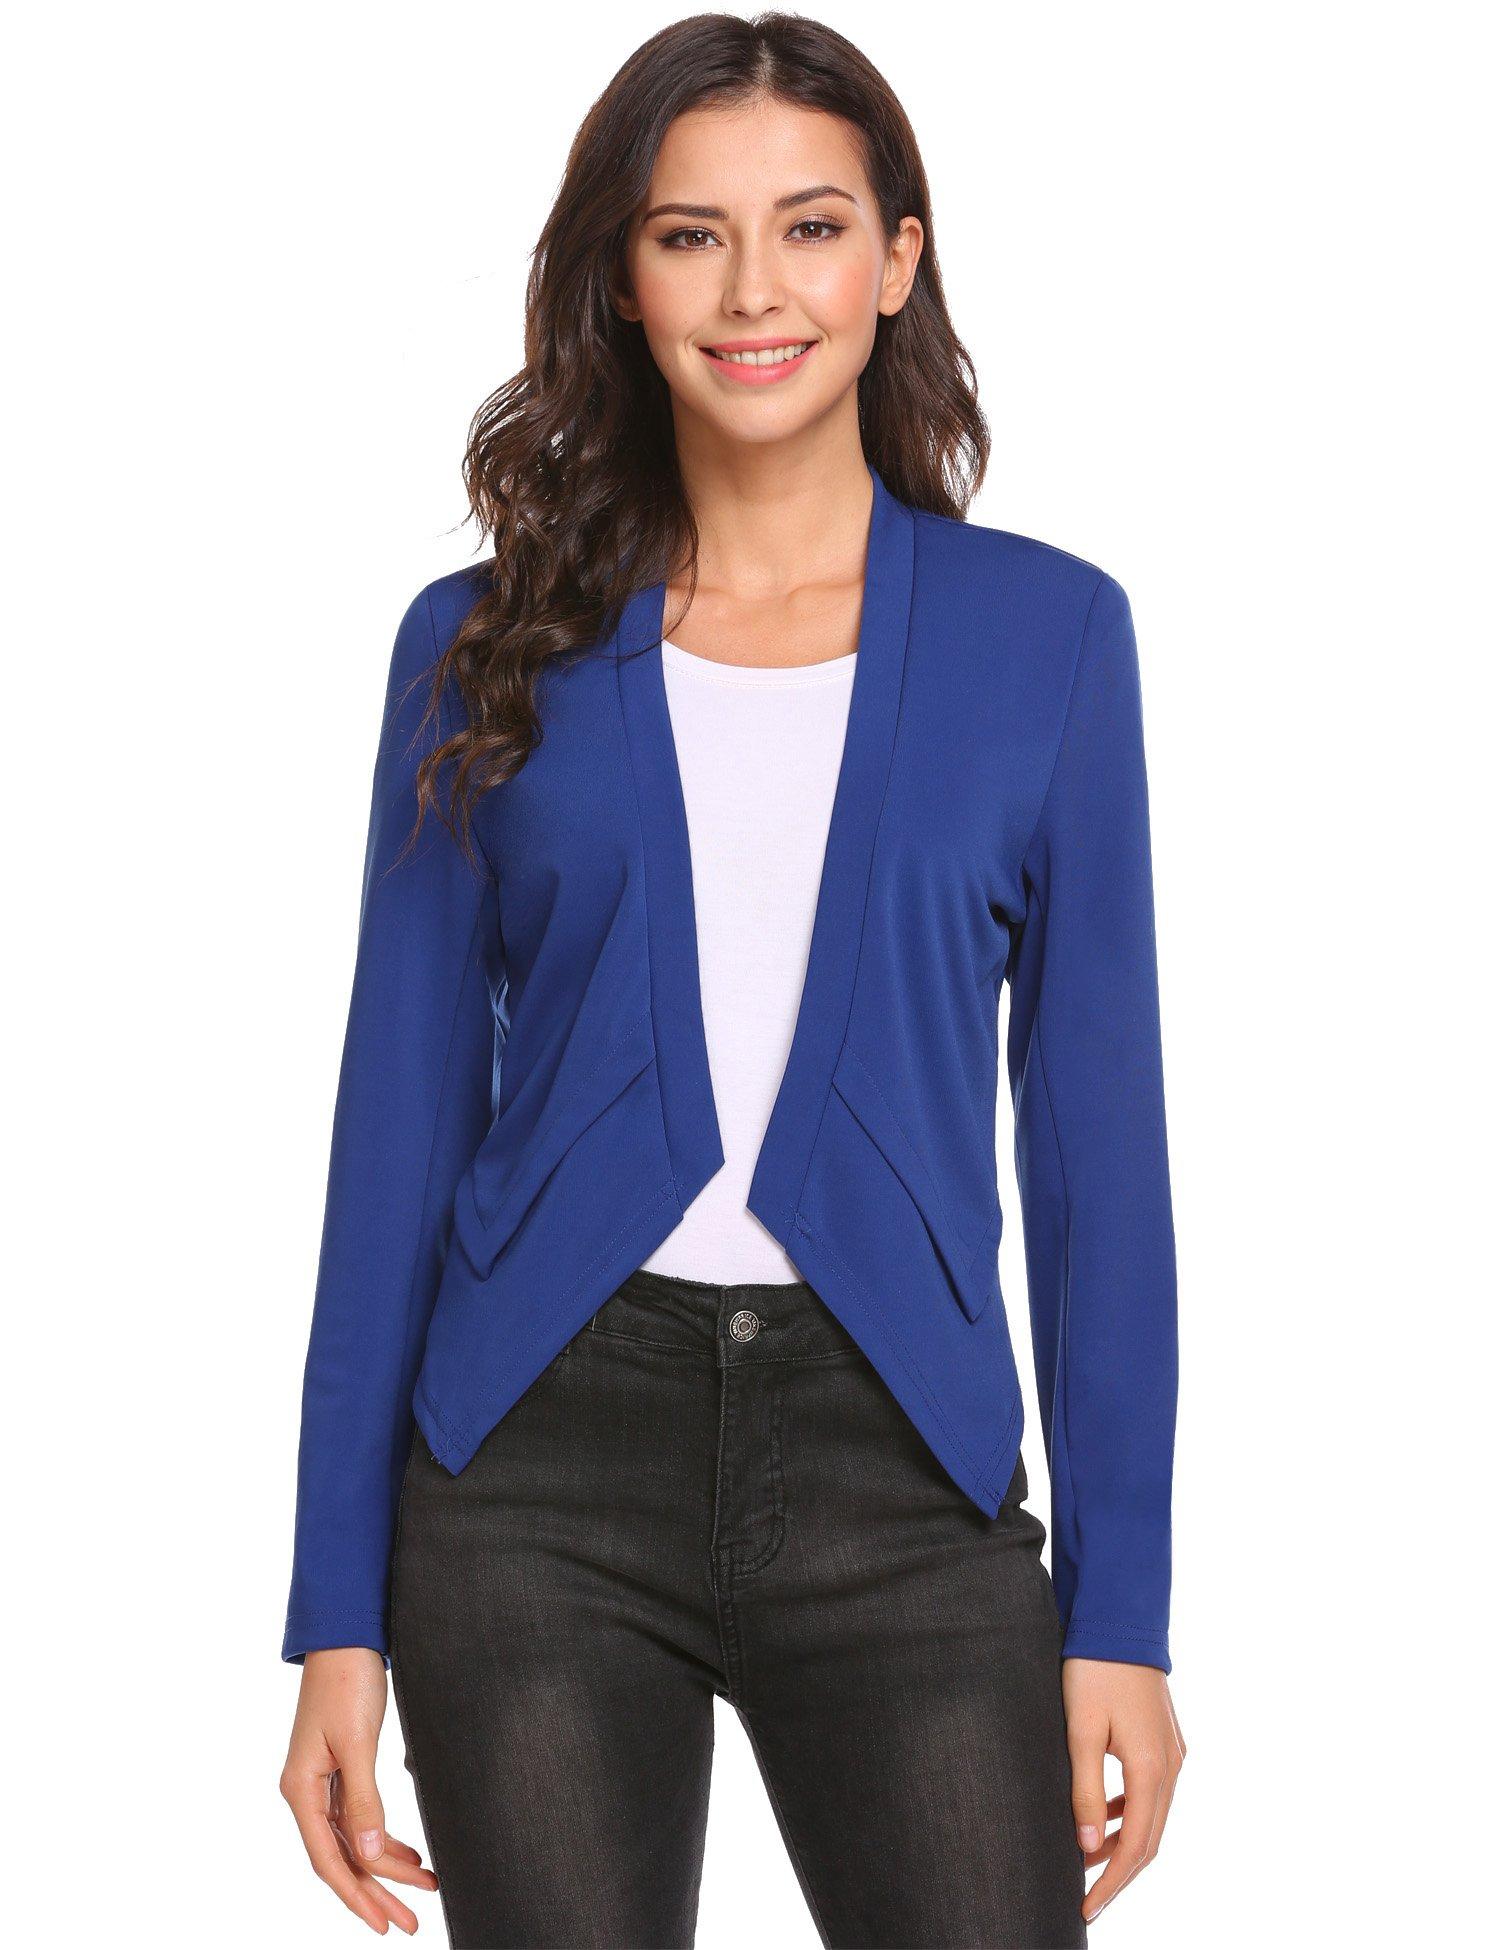 Burlady Women's Collarless Long Sleeve Casual Work Office Open Front Blazer Jacket, Blue, Large